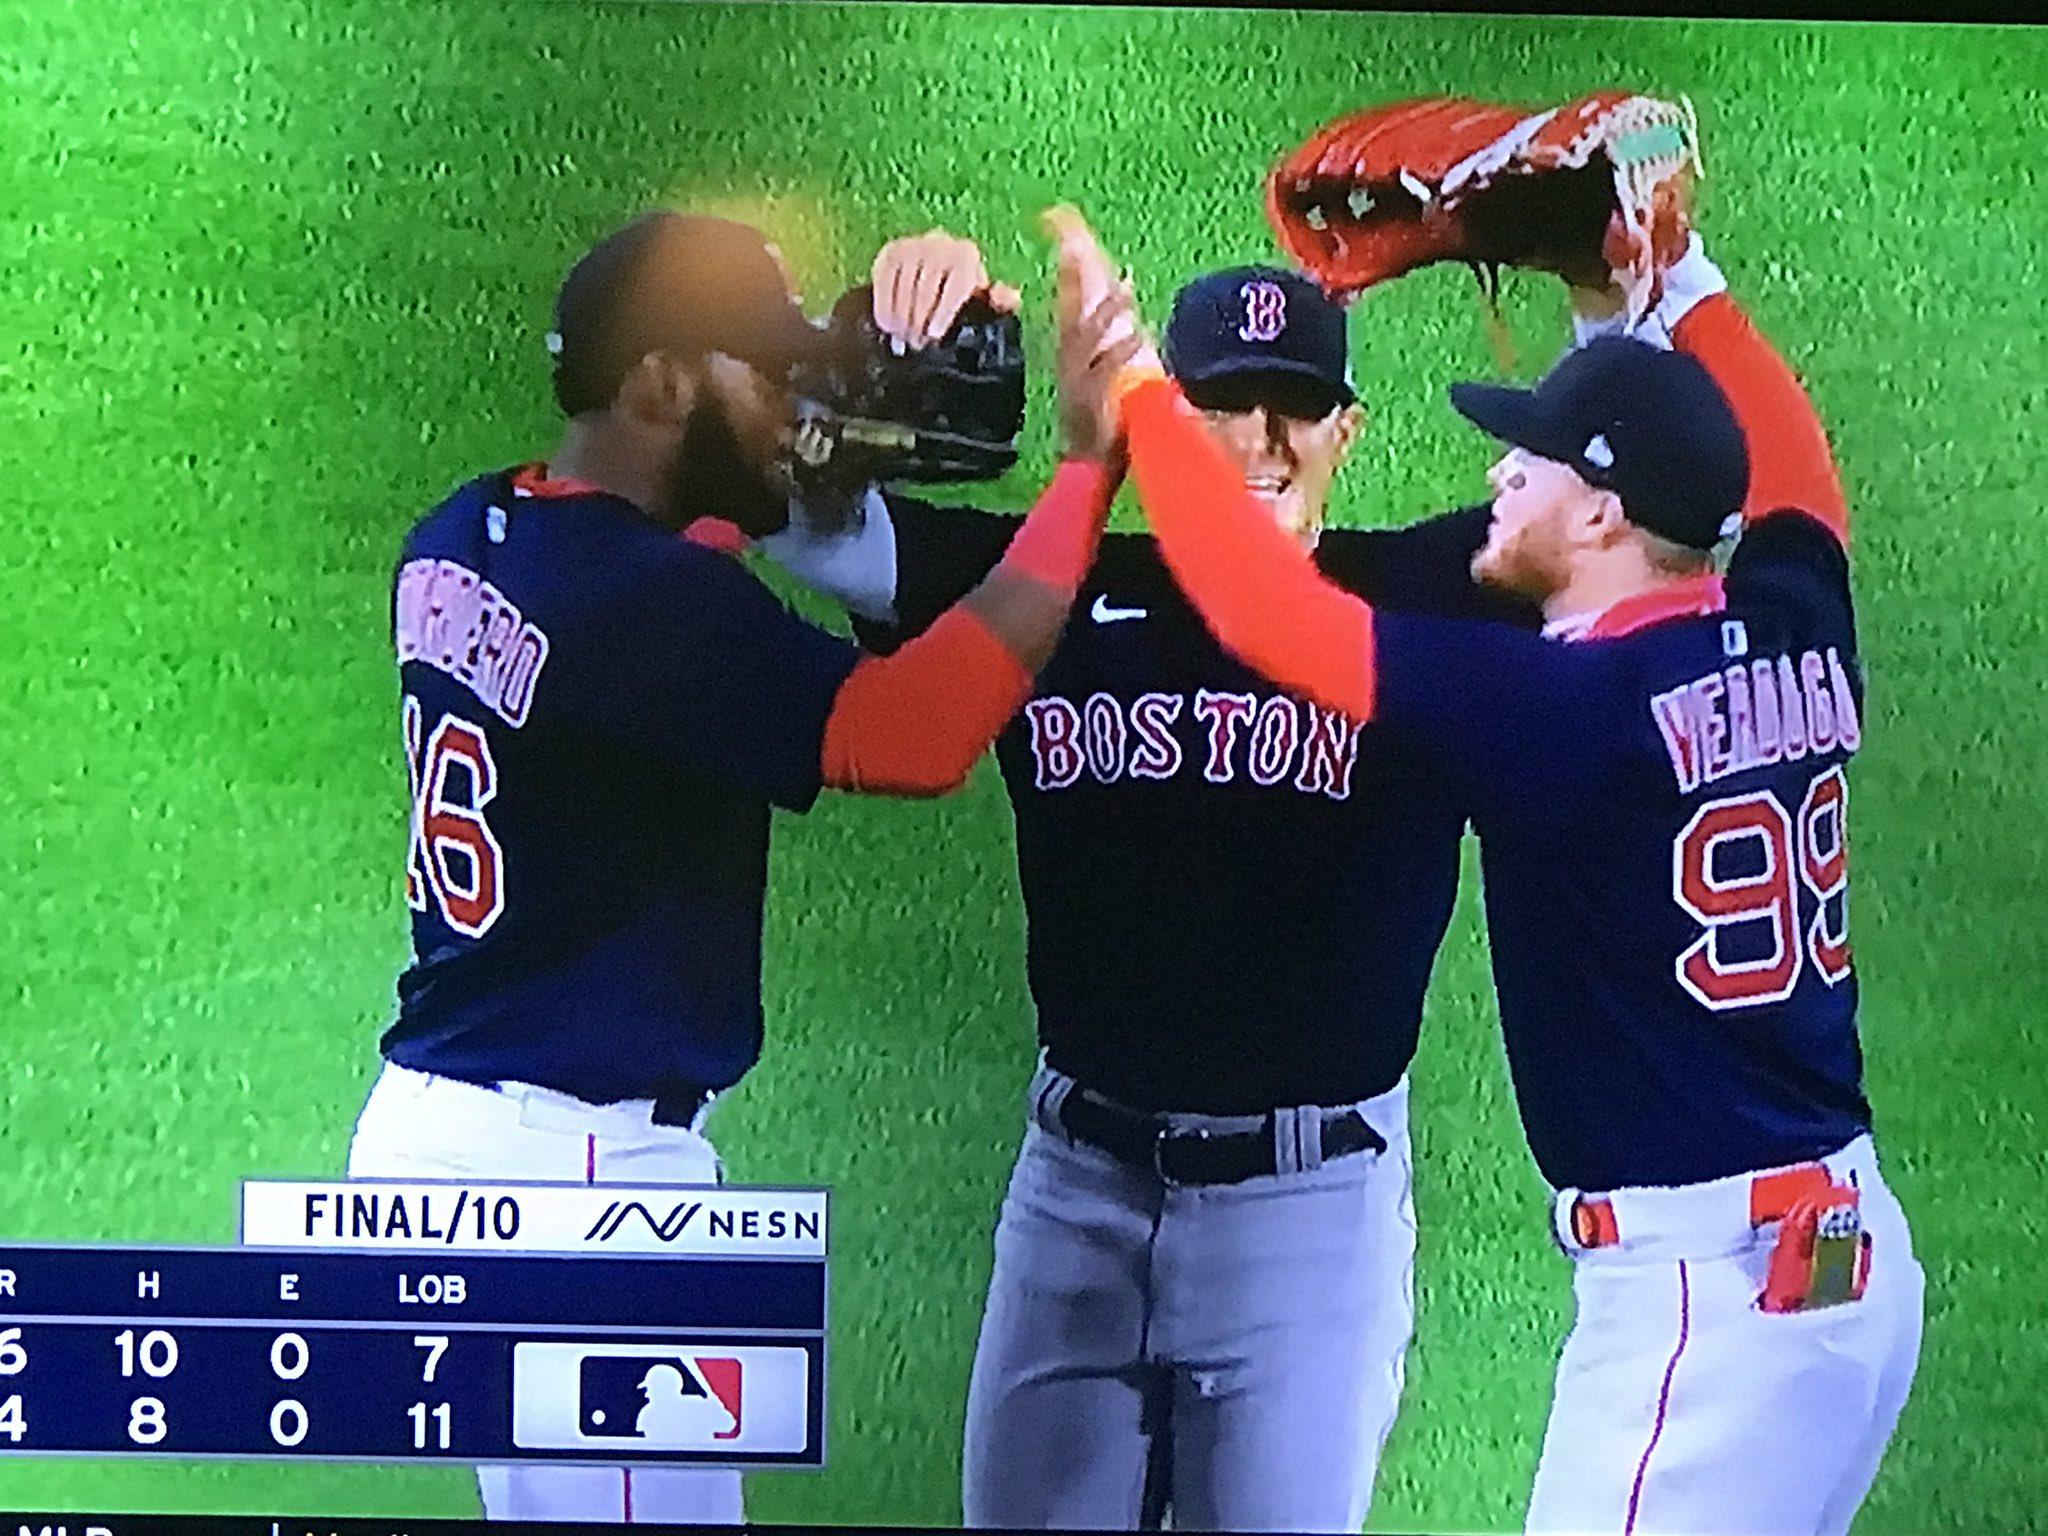 Red Sox Verdugo